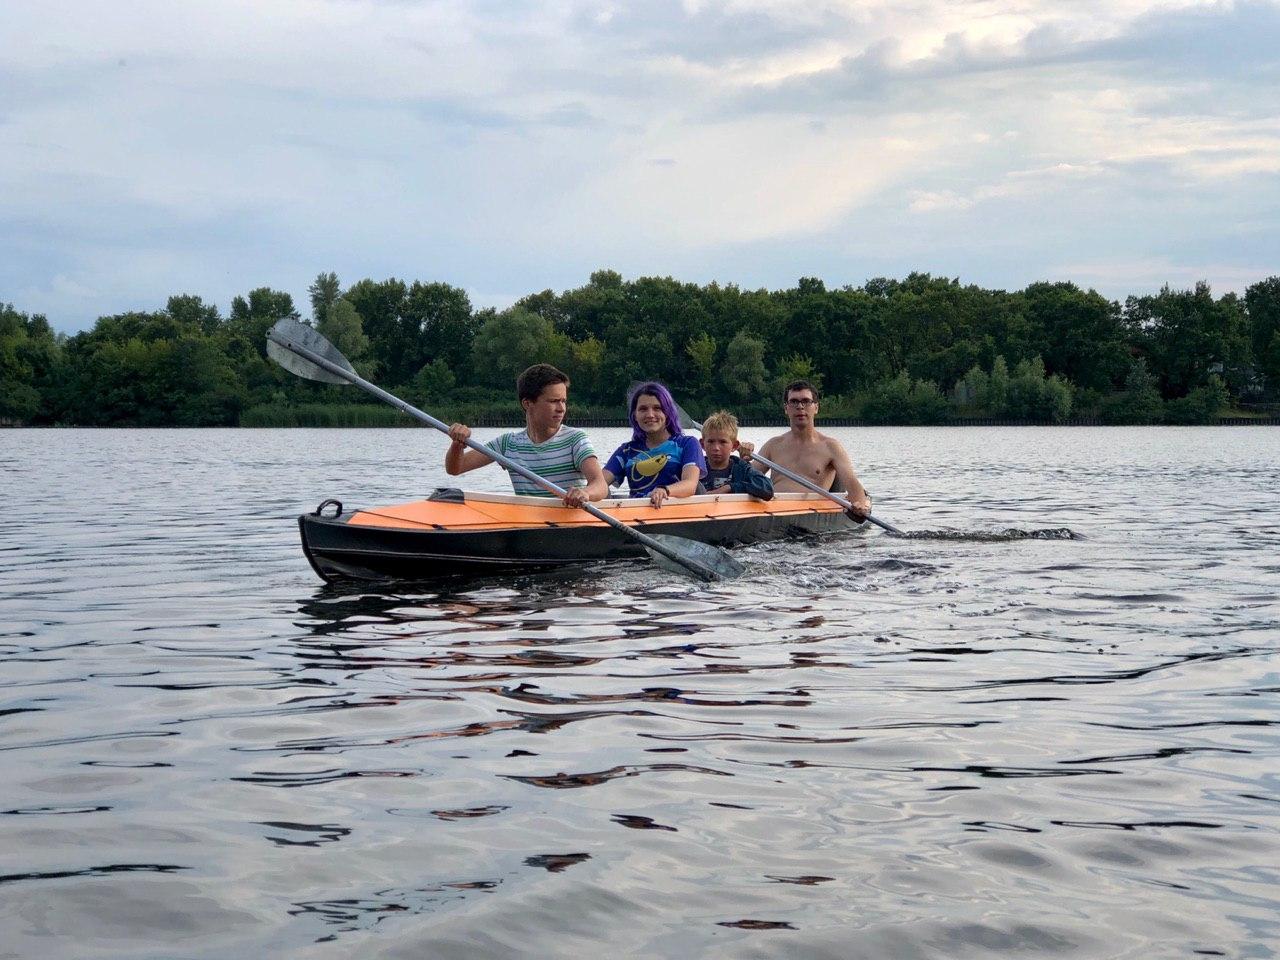 Kayaking trip around the bays of the Dnieper River around the island